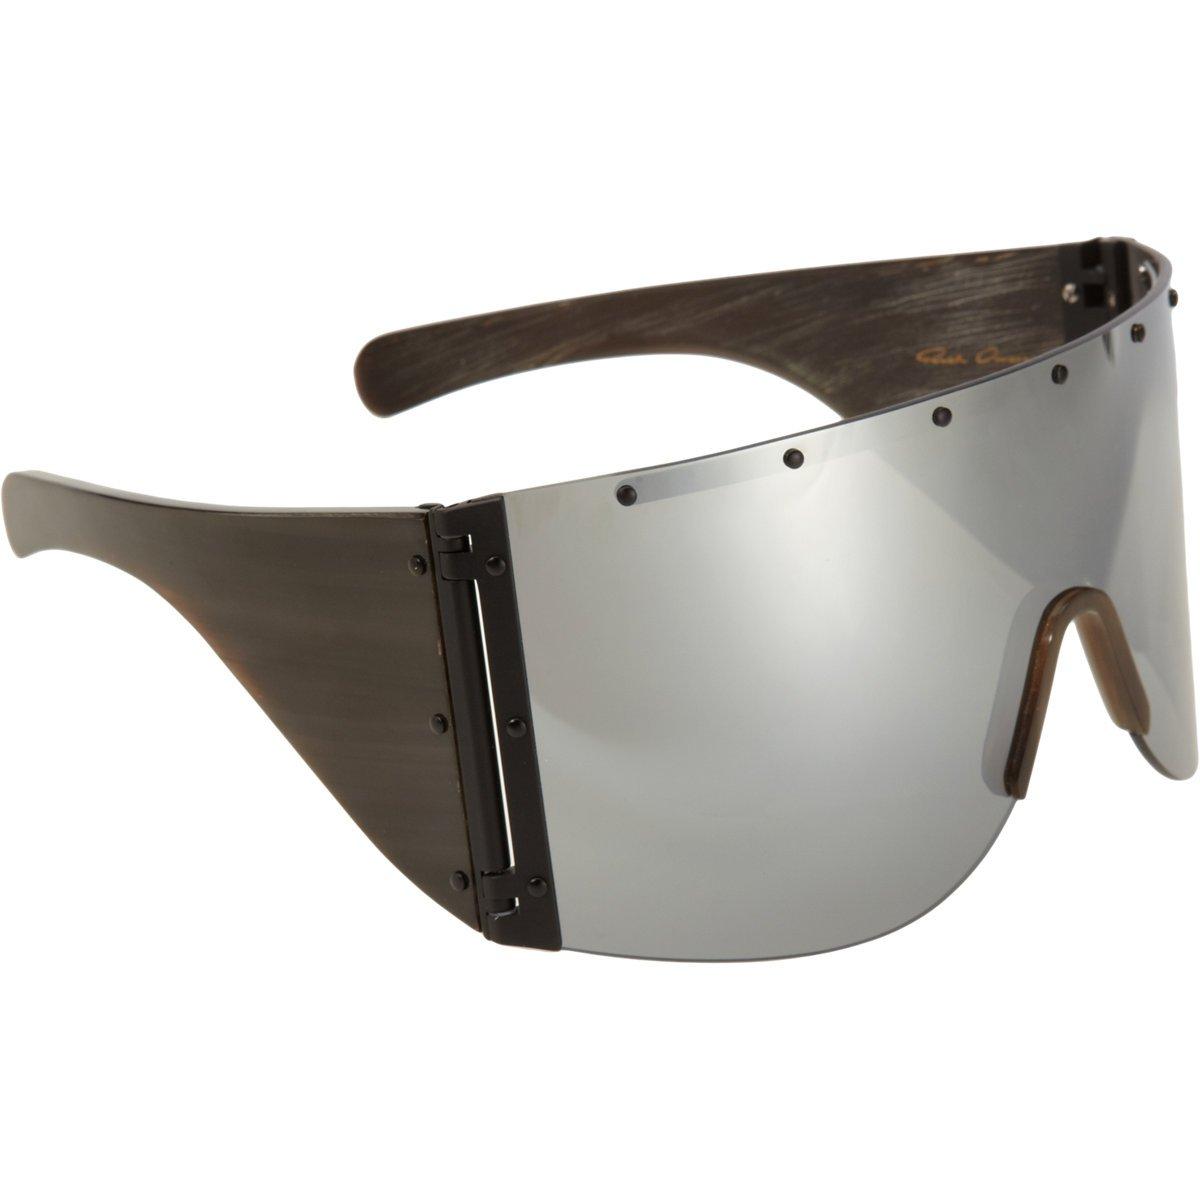 2b7649de537 Rick Owens Oversized Shield Sunglasses in Black for Men - Lyst